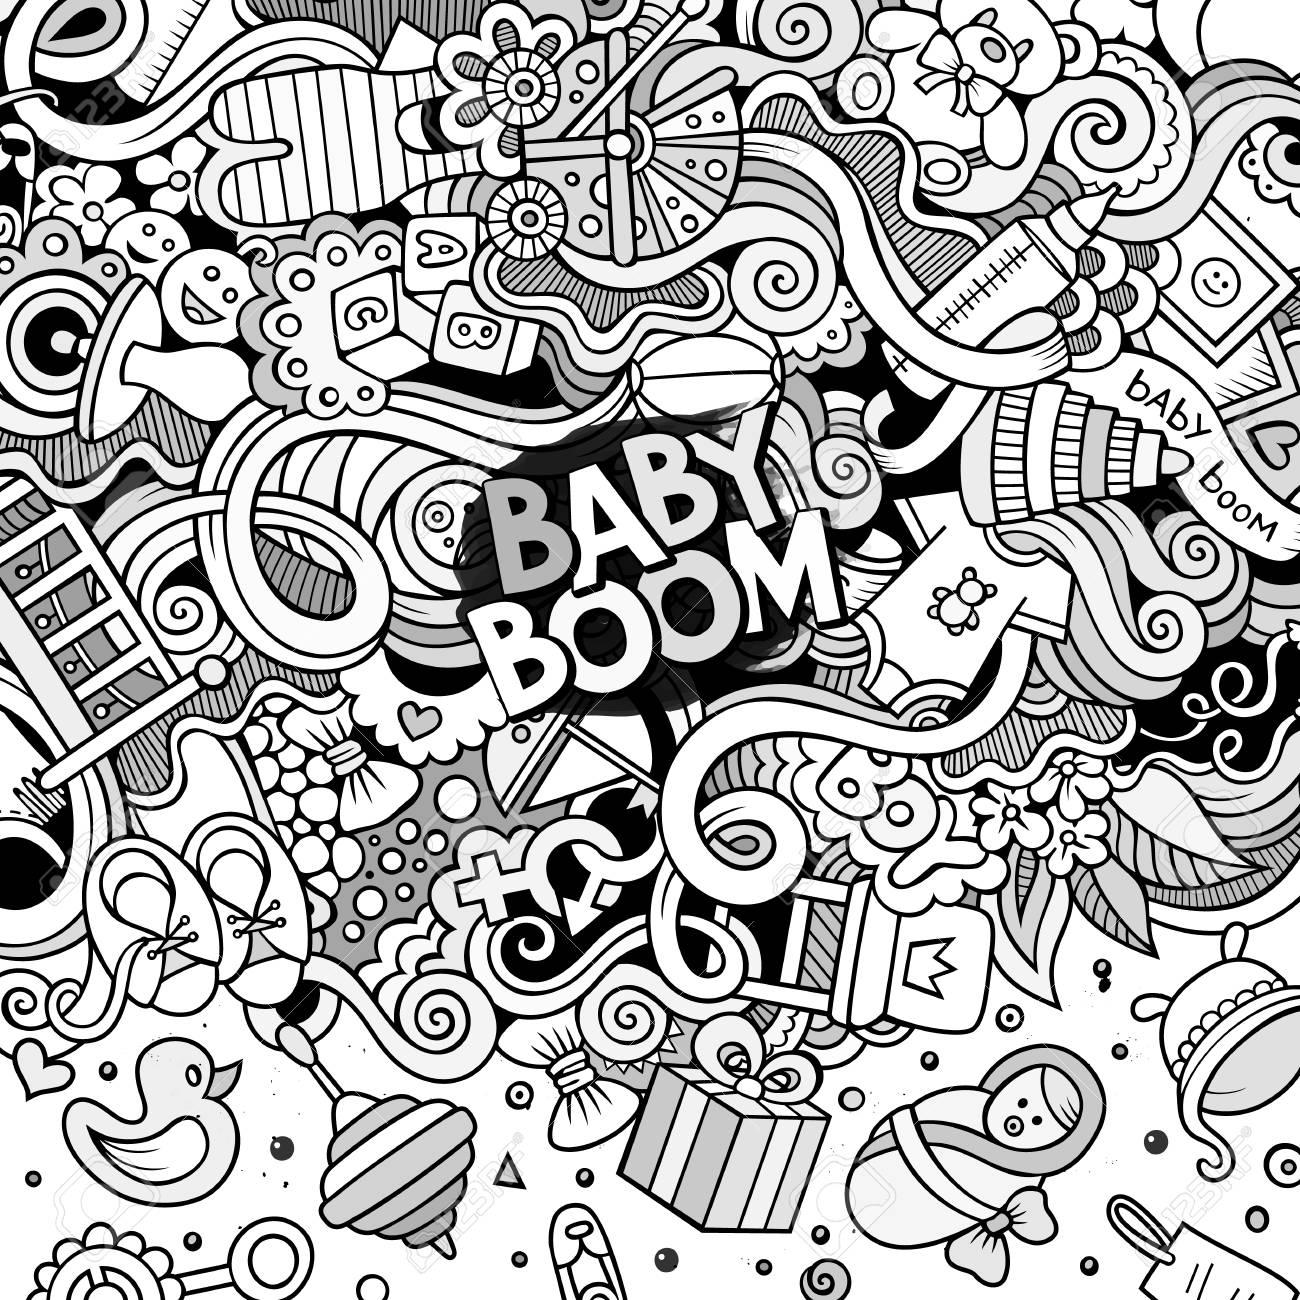 Cartoon cute doodles hand drawn baby frame design  Line art detailed,